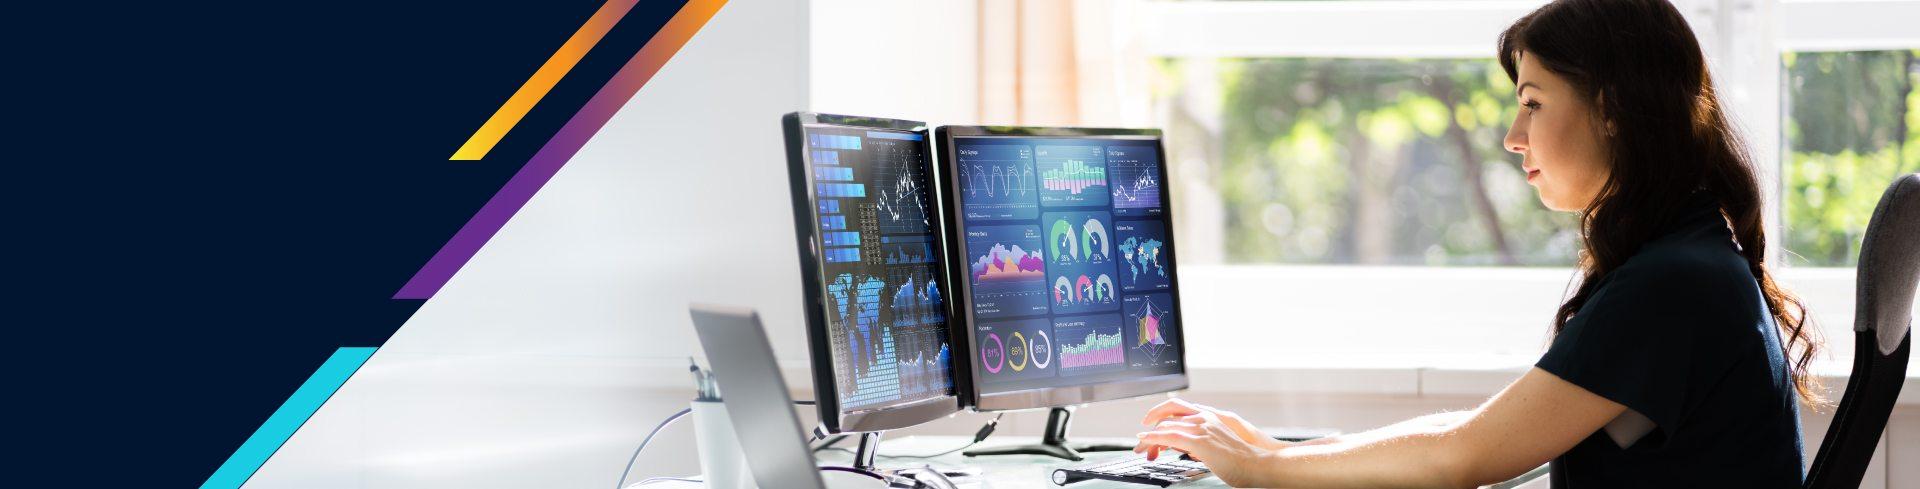 Chica analizando datos en computador